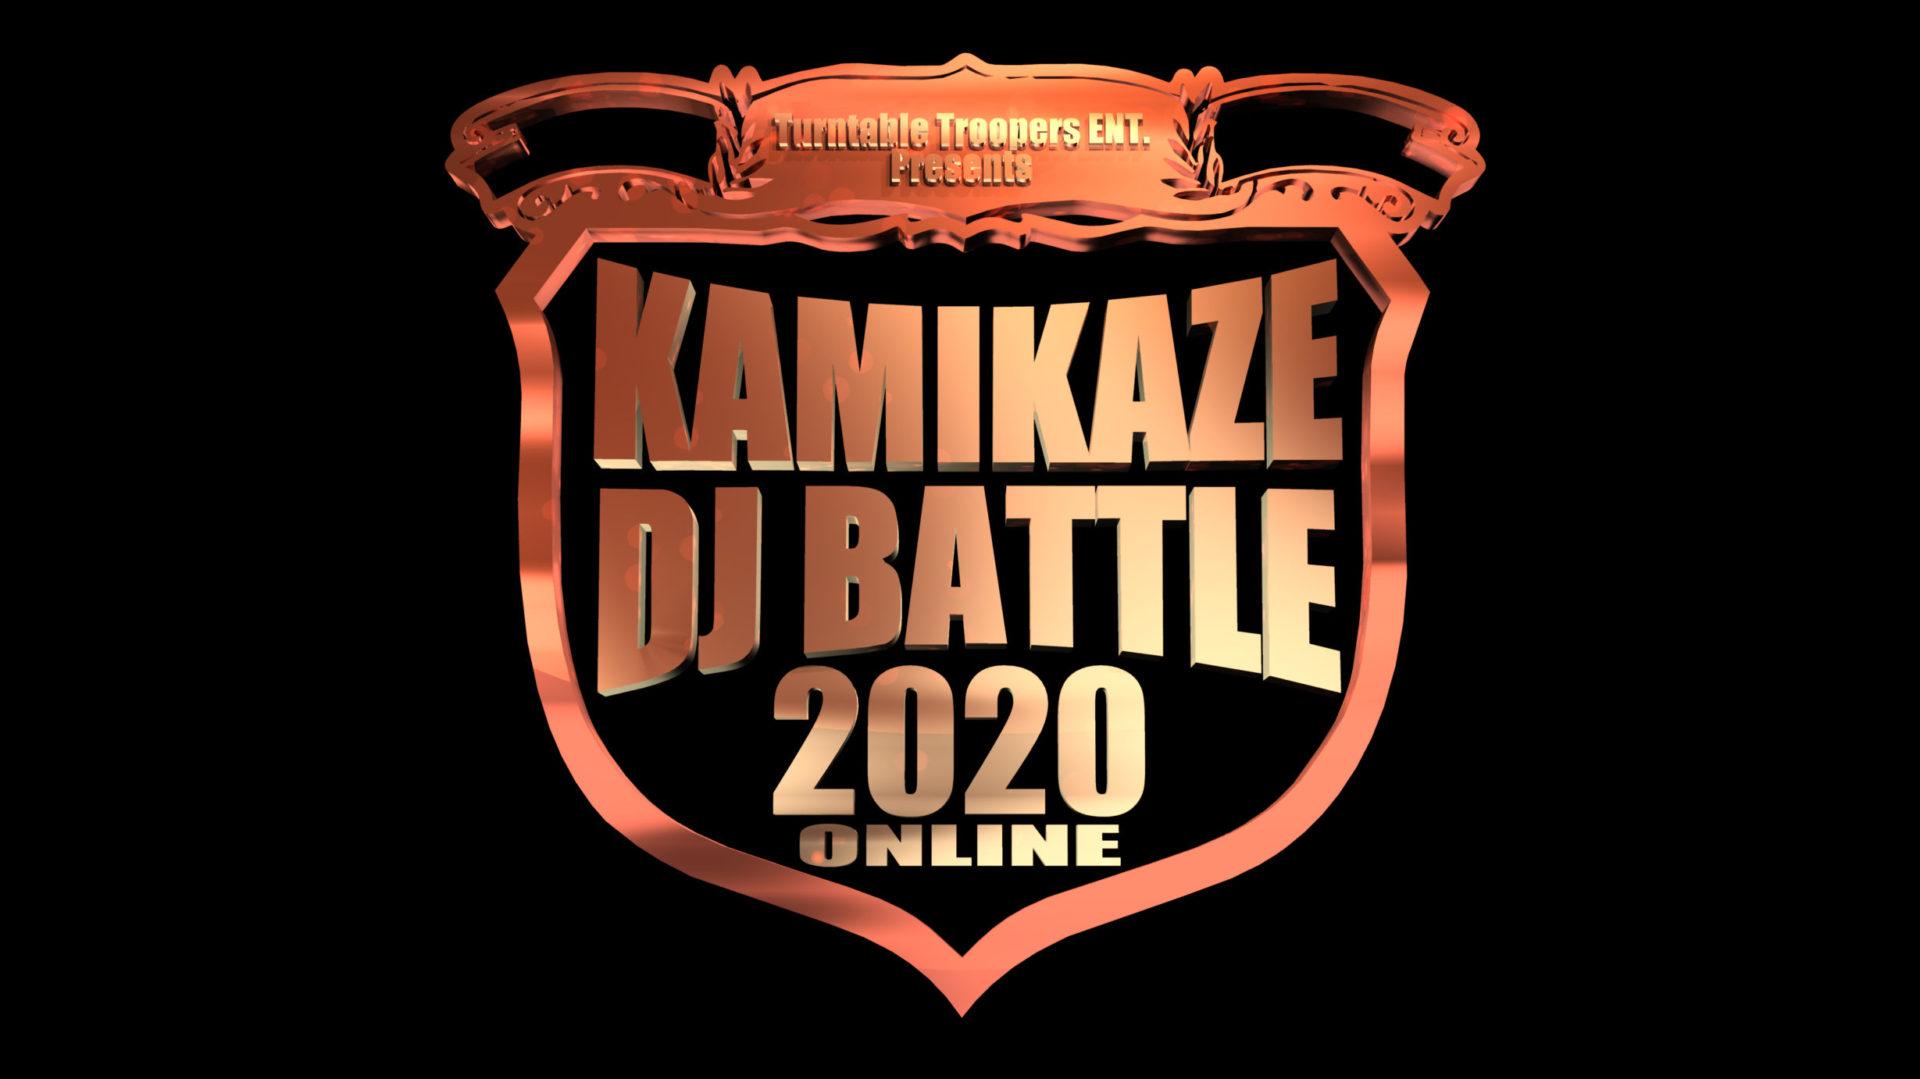 T.T.E. Presents KAMIKAZE DJ BATTLE 2020 ONLINE